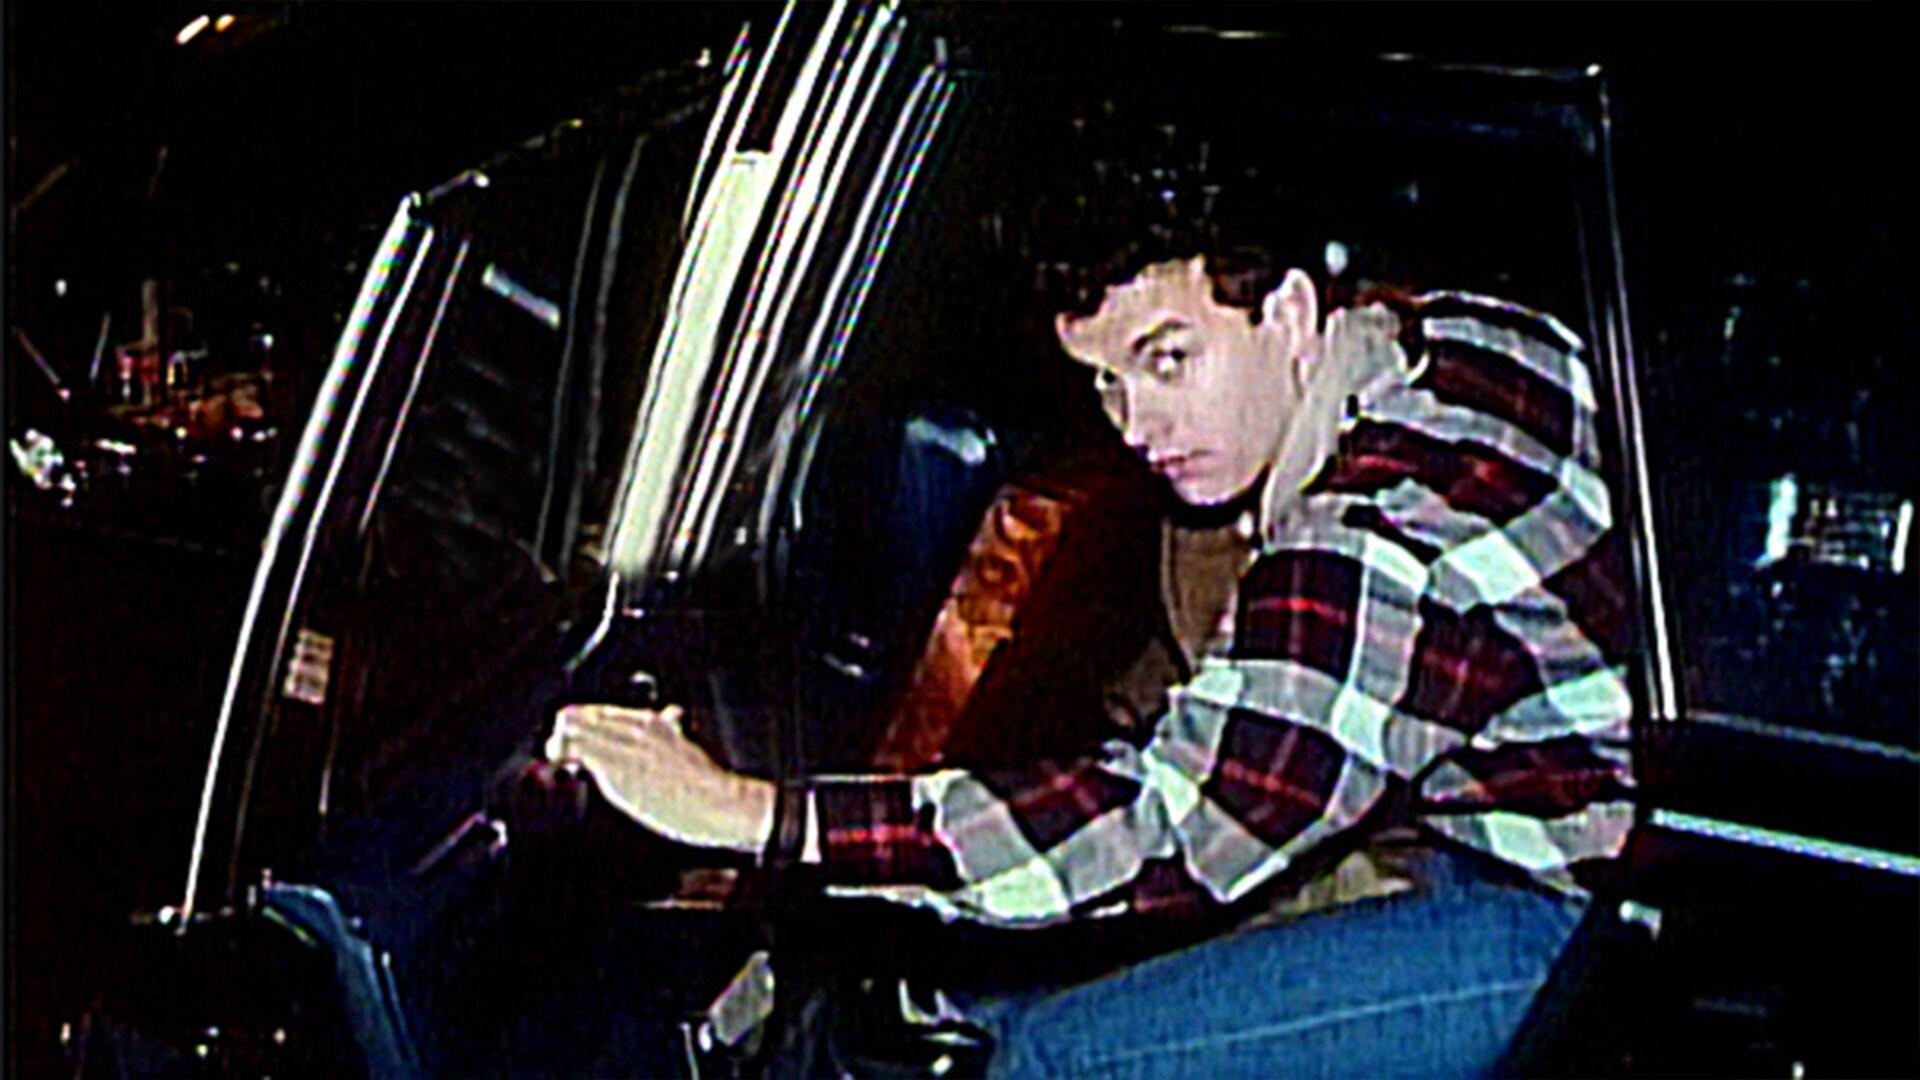 Tom Hanks: November 14, 1985